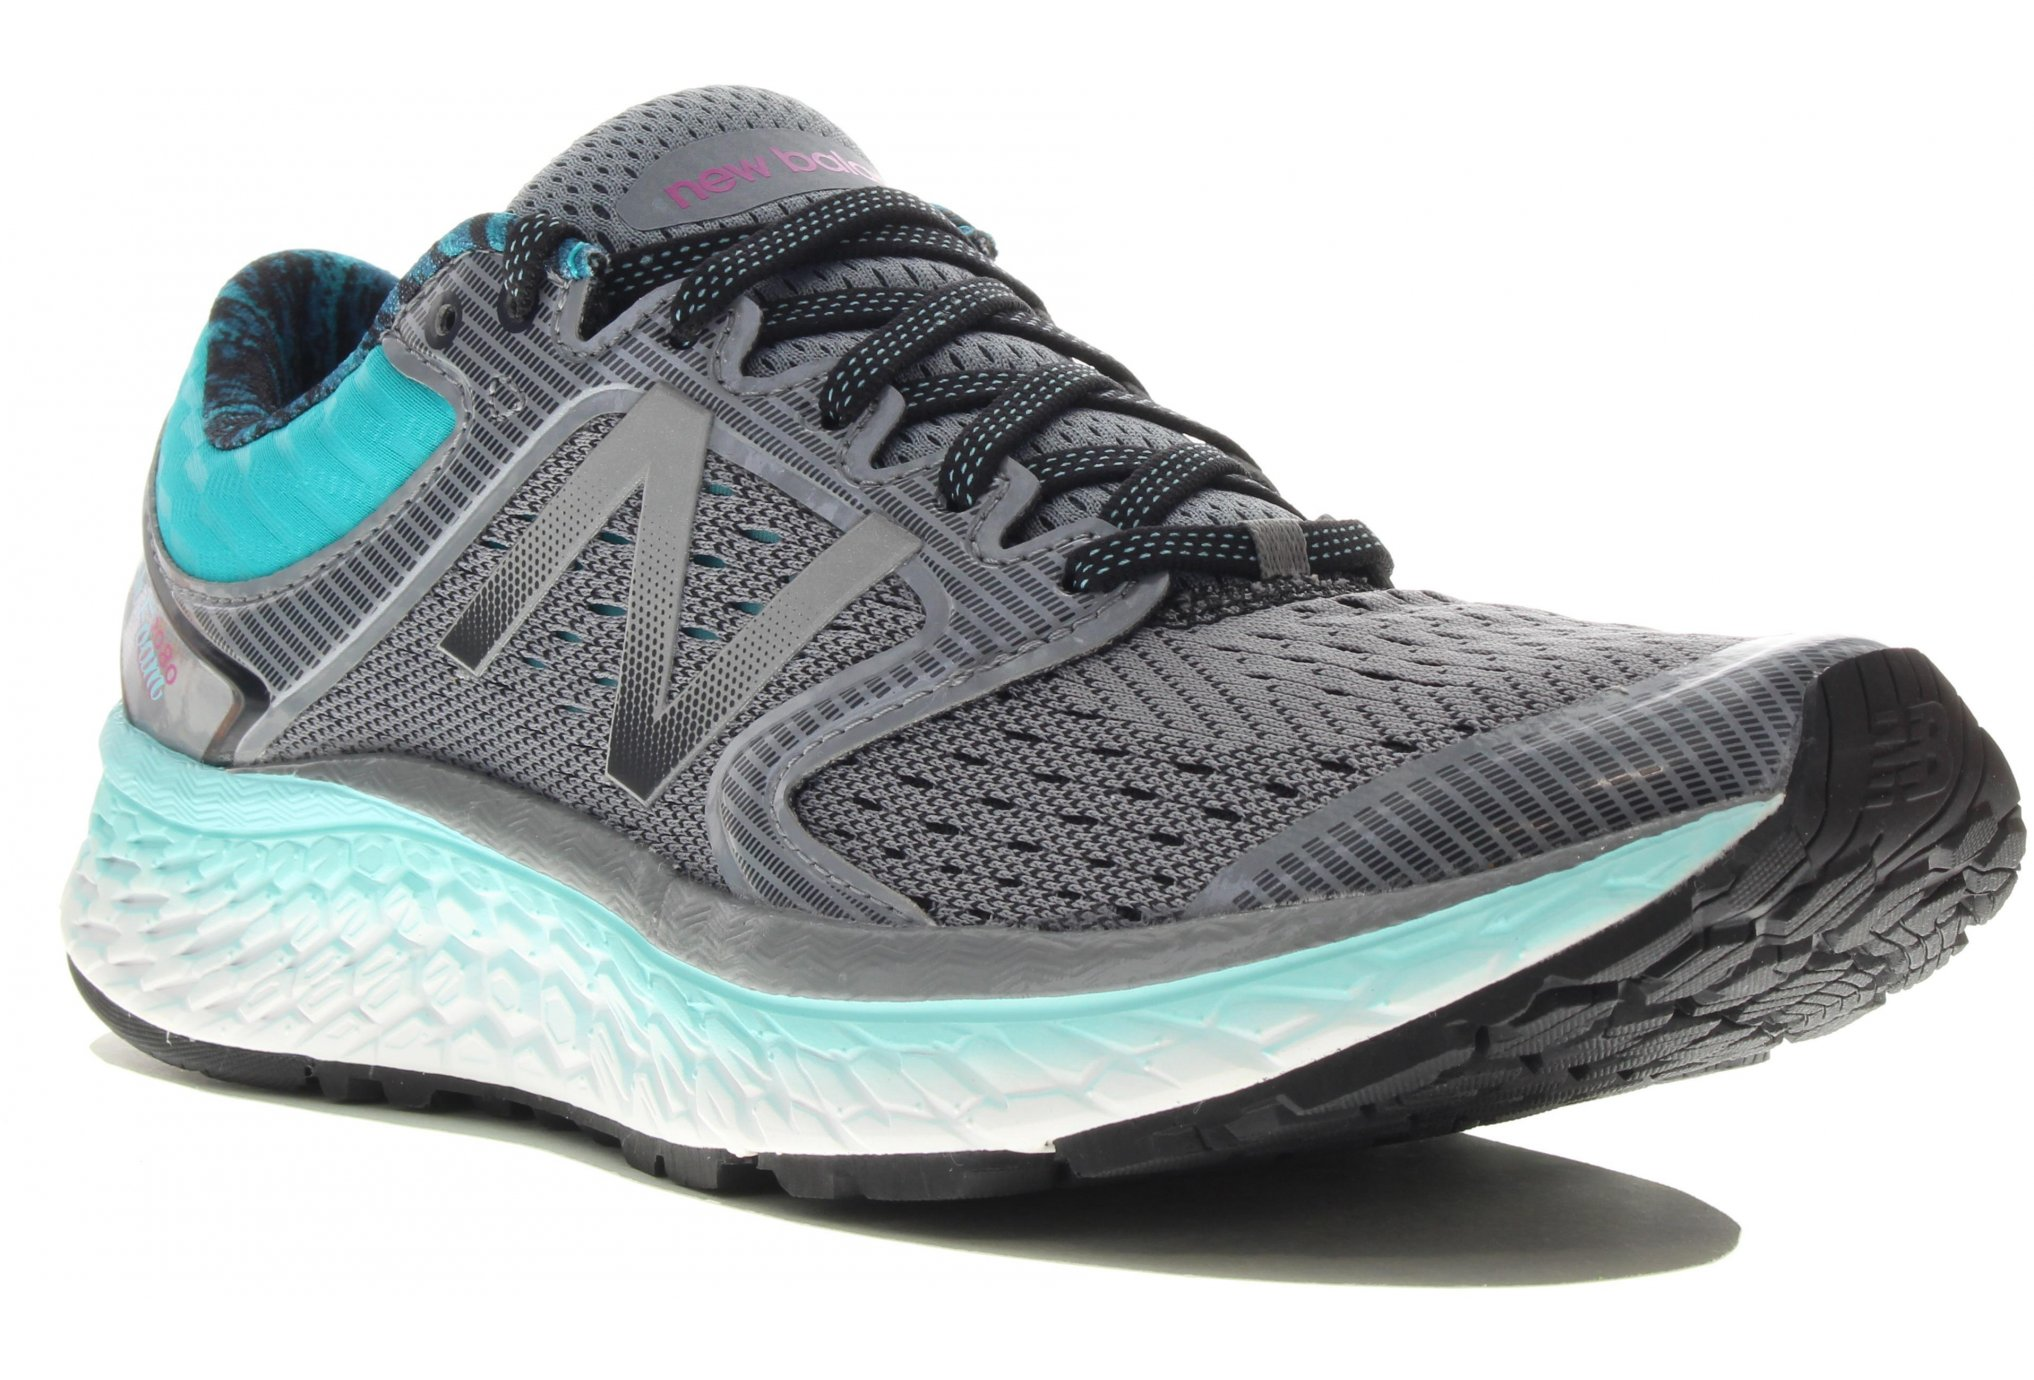 New Balance Fresh Foam W 1080 V7 - B Chaussures running femme